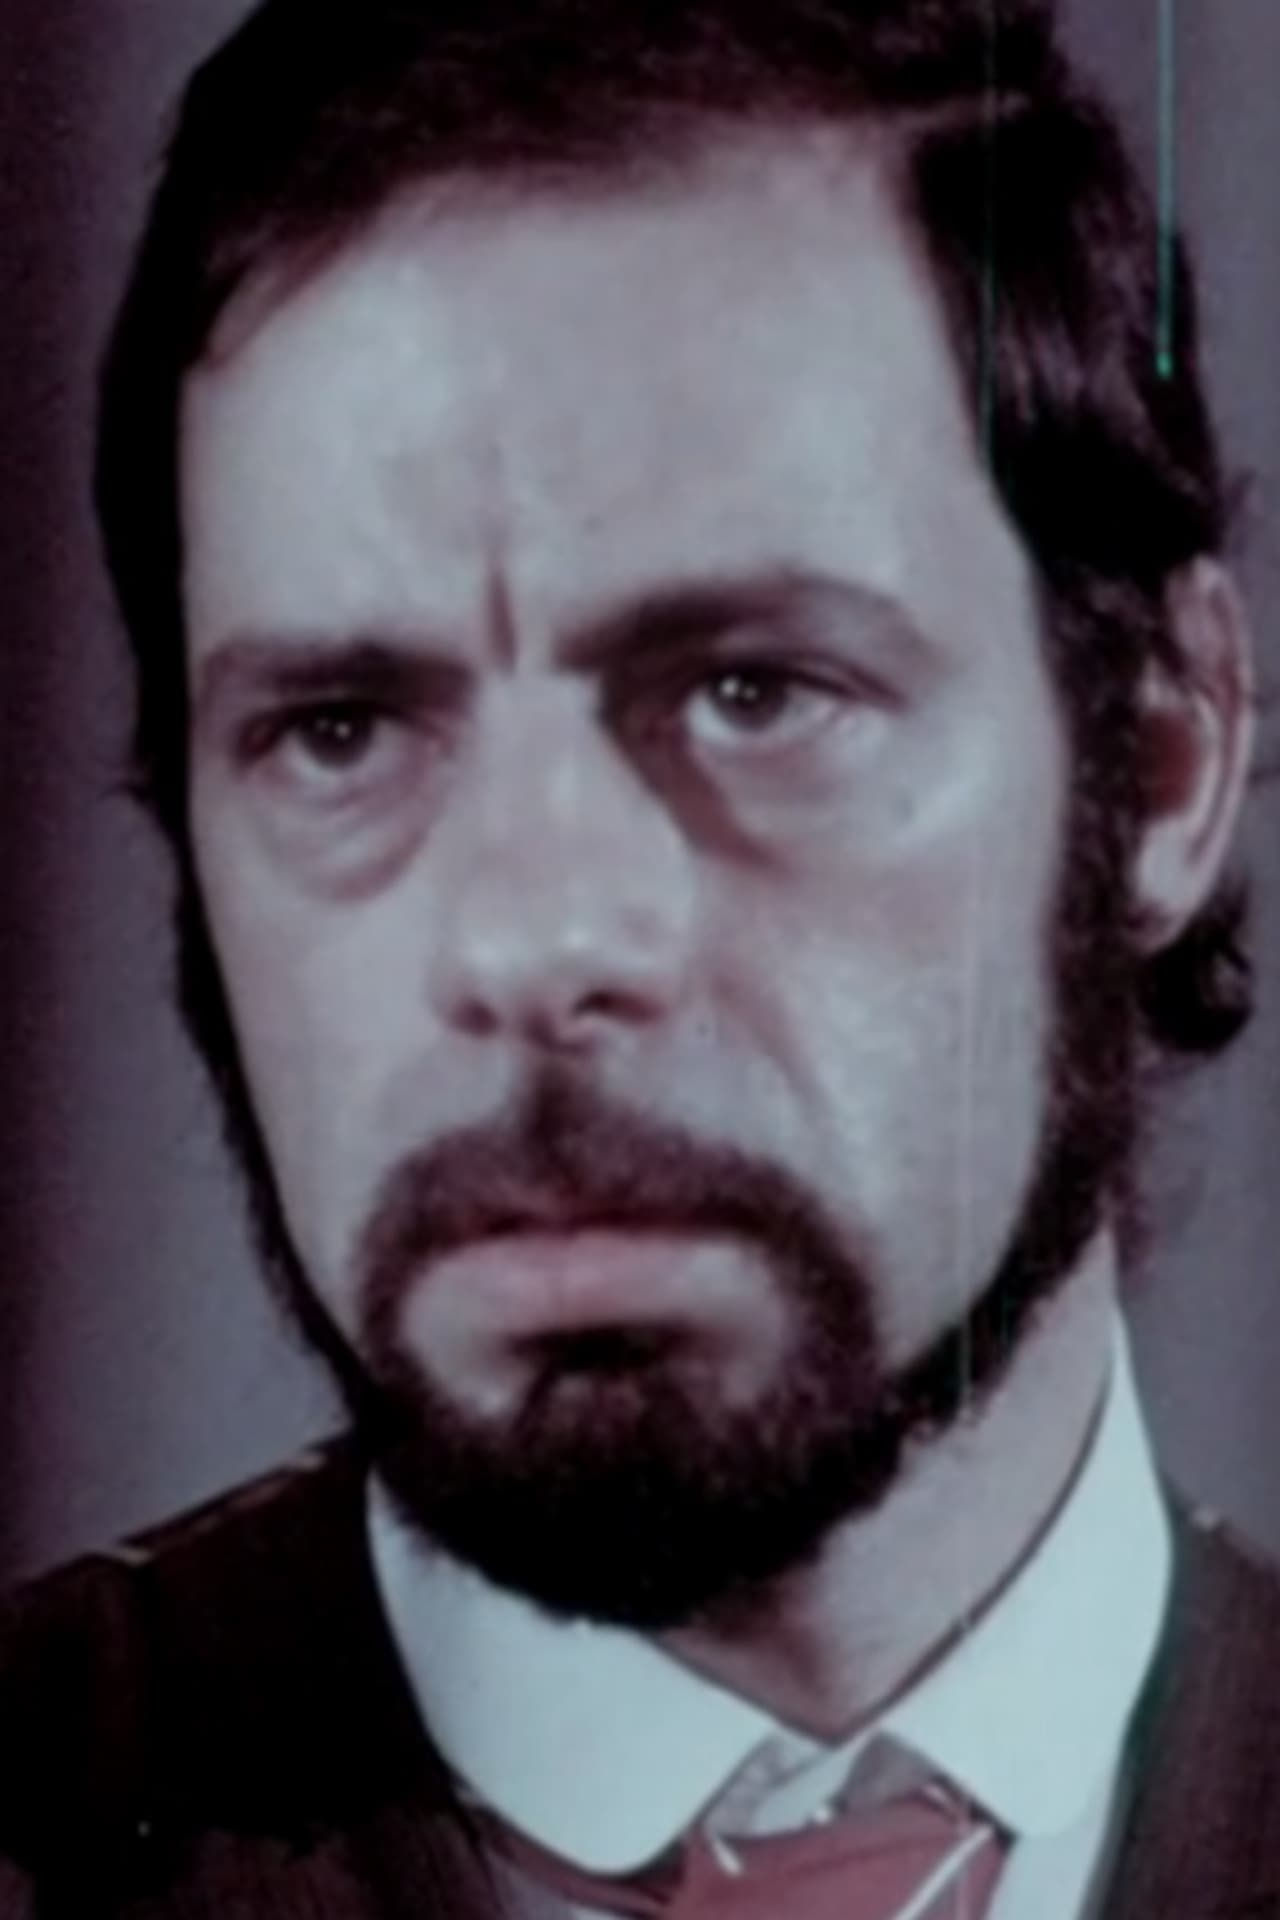 Michael Fischetti